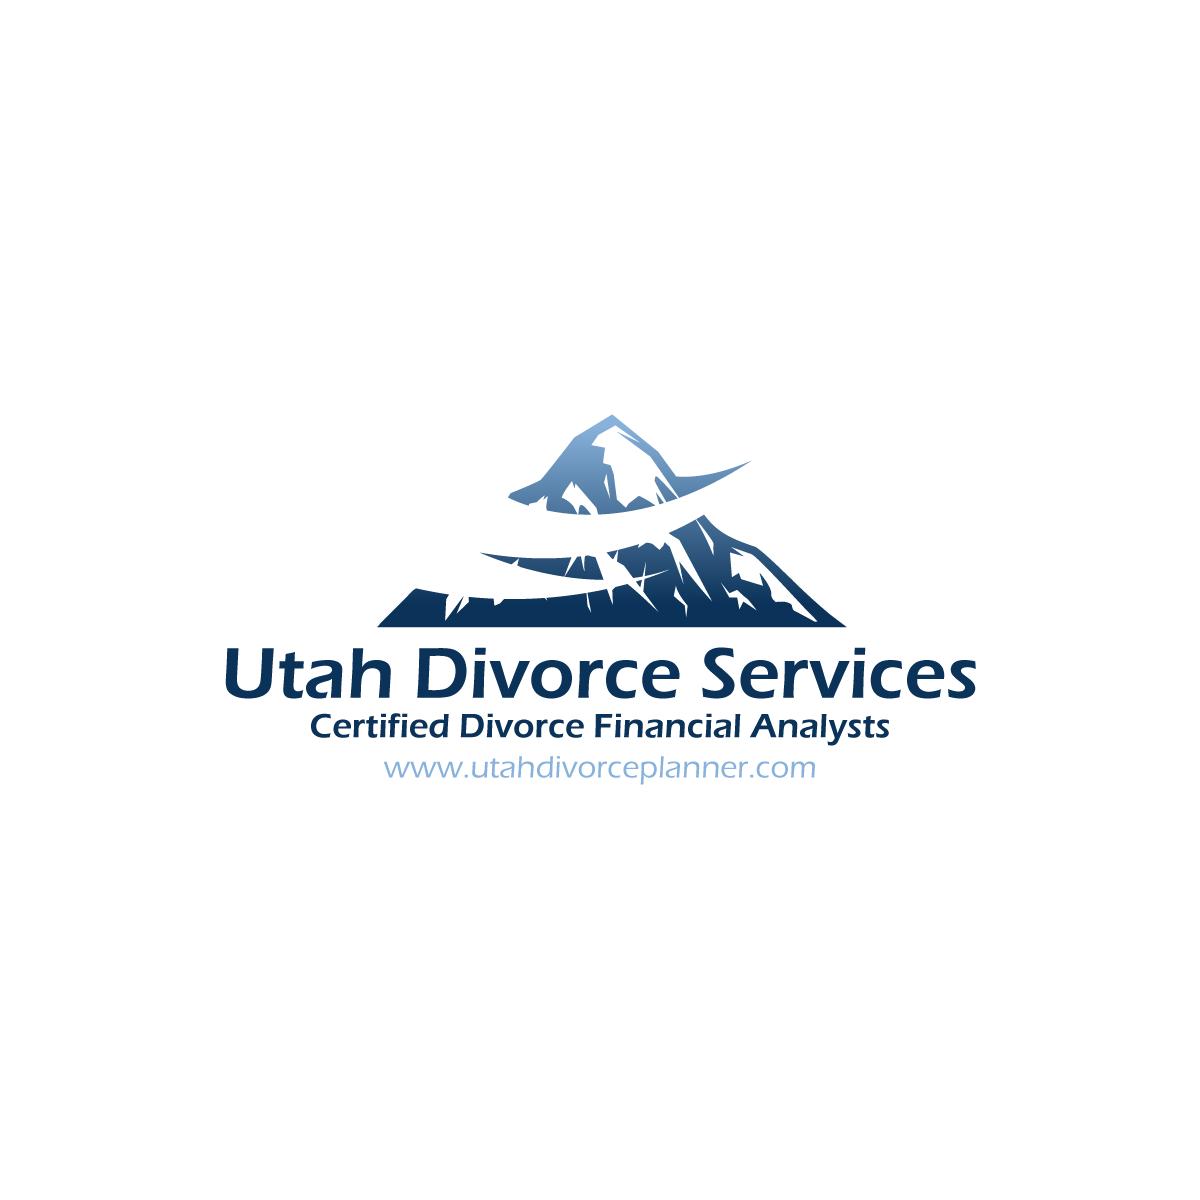 Utah Divorce Services